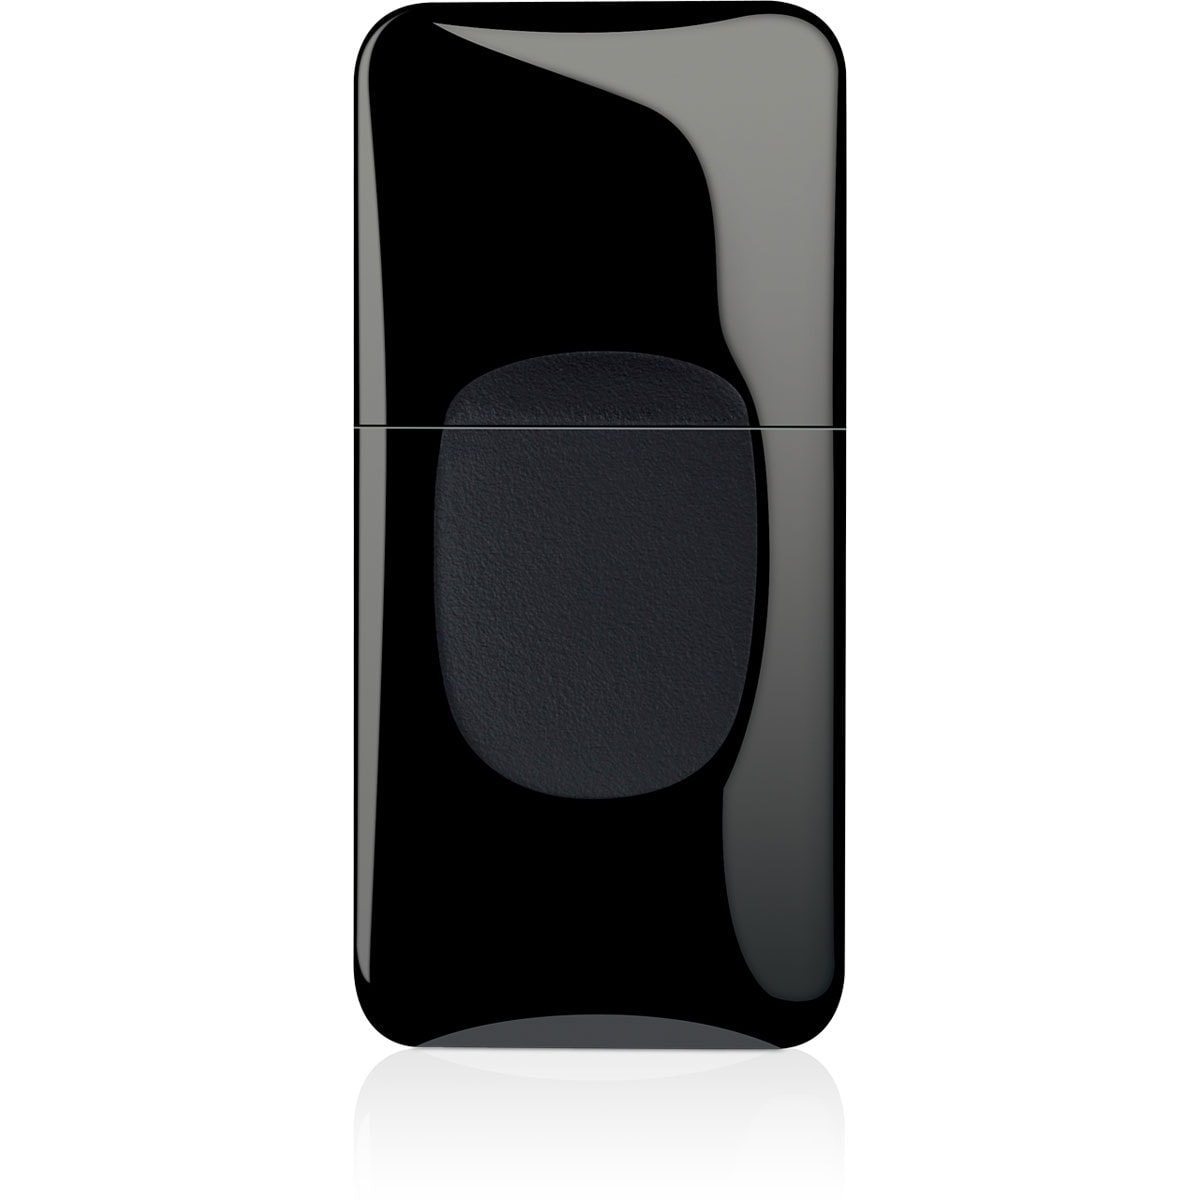 TP-Link Clé USB WiFi 802.11n/g/b - TL-WN823N (300MB) - Carte réseau - 2